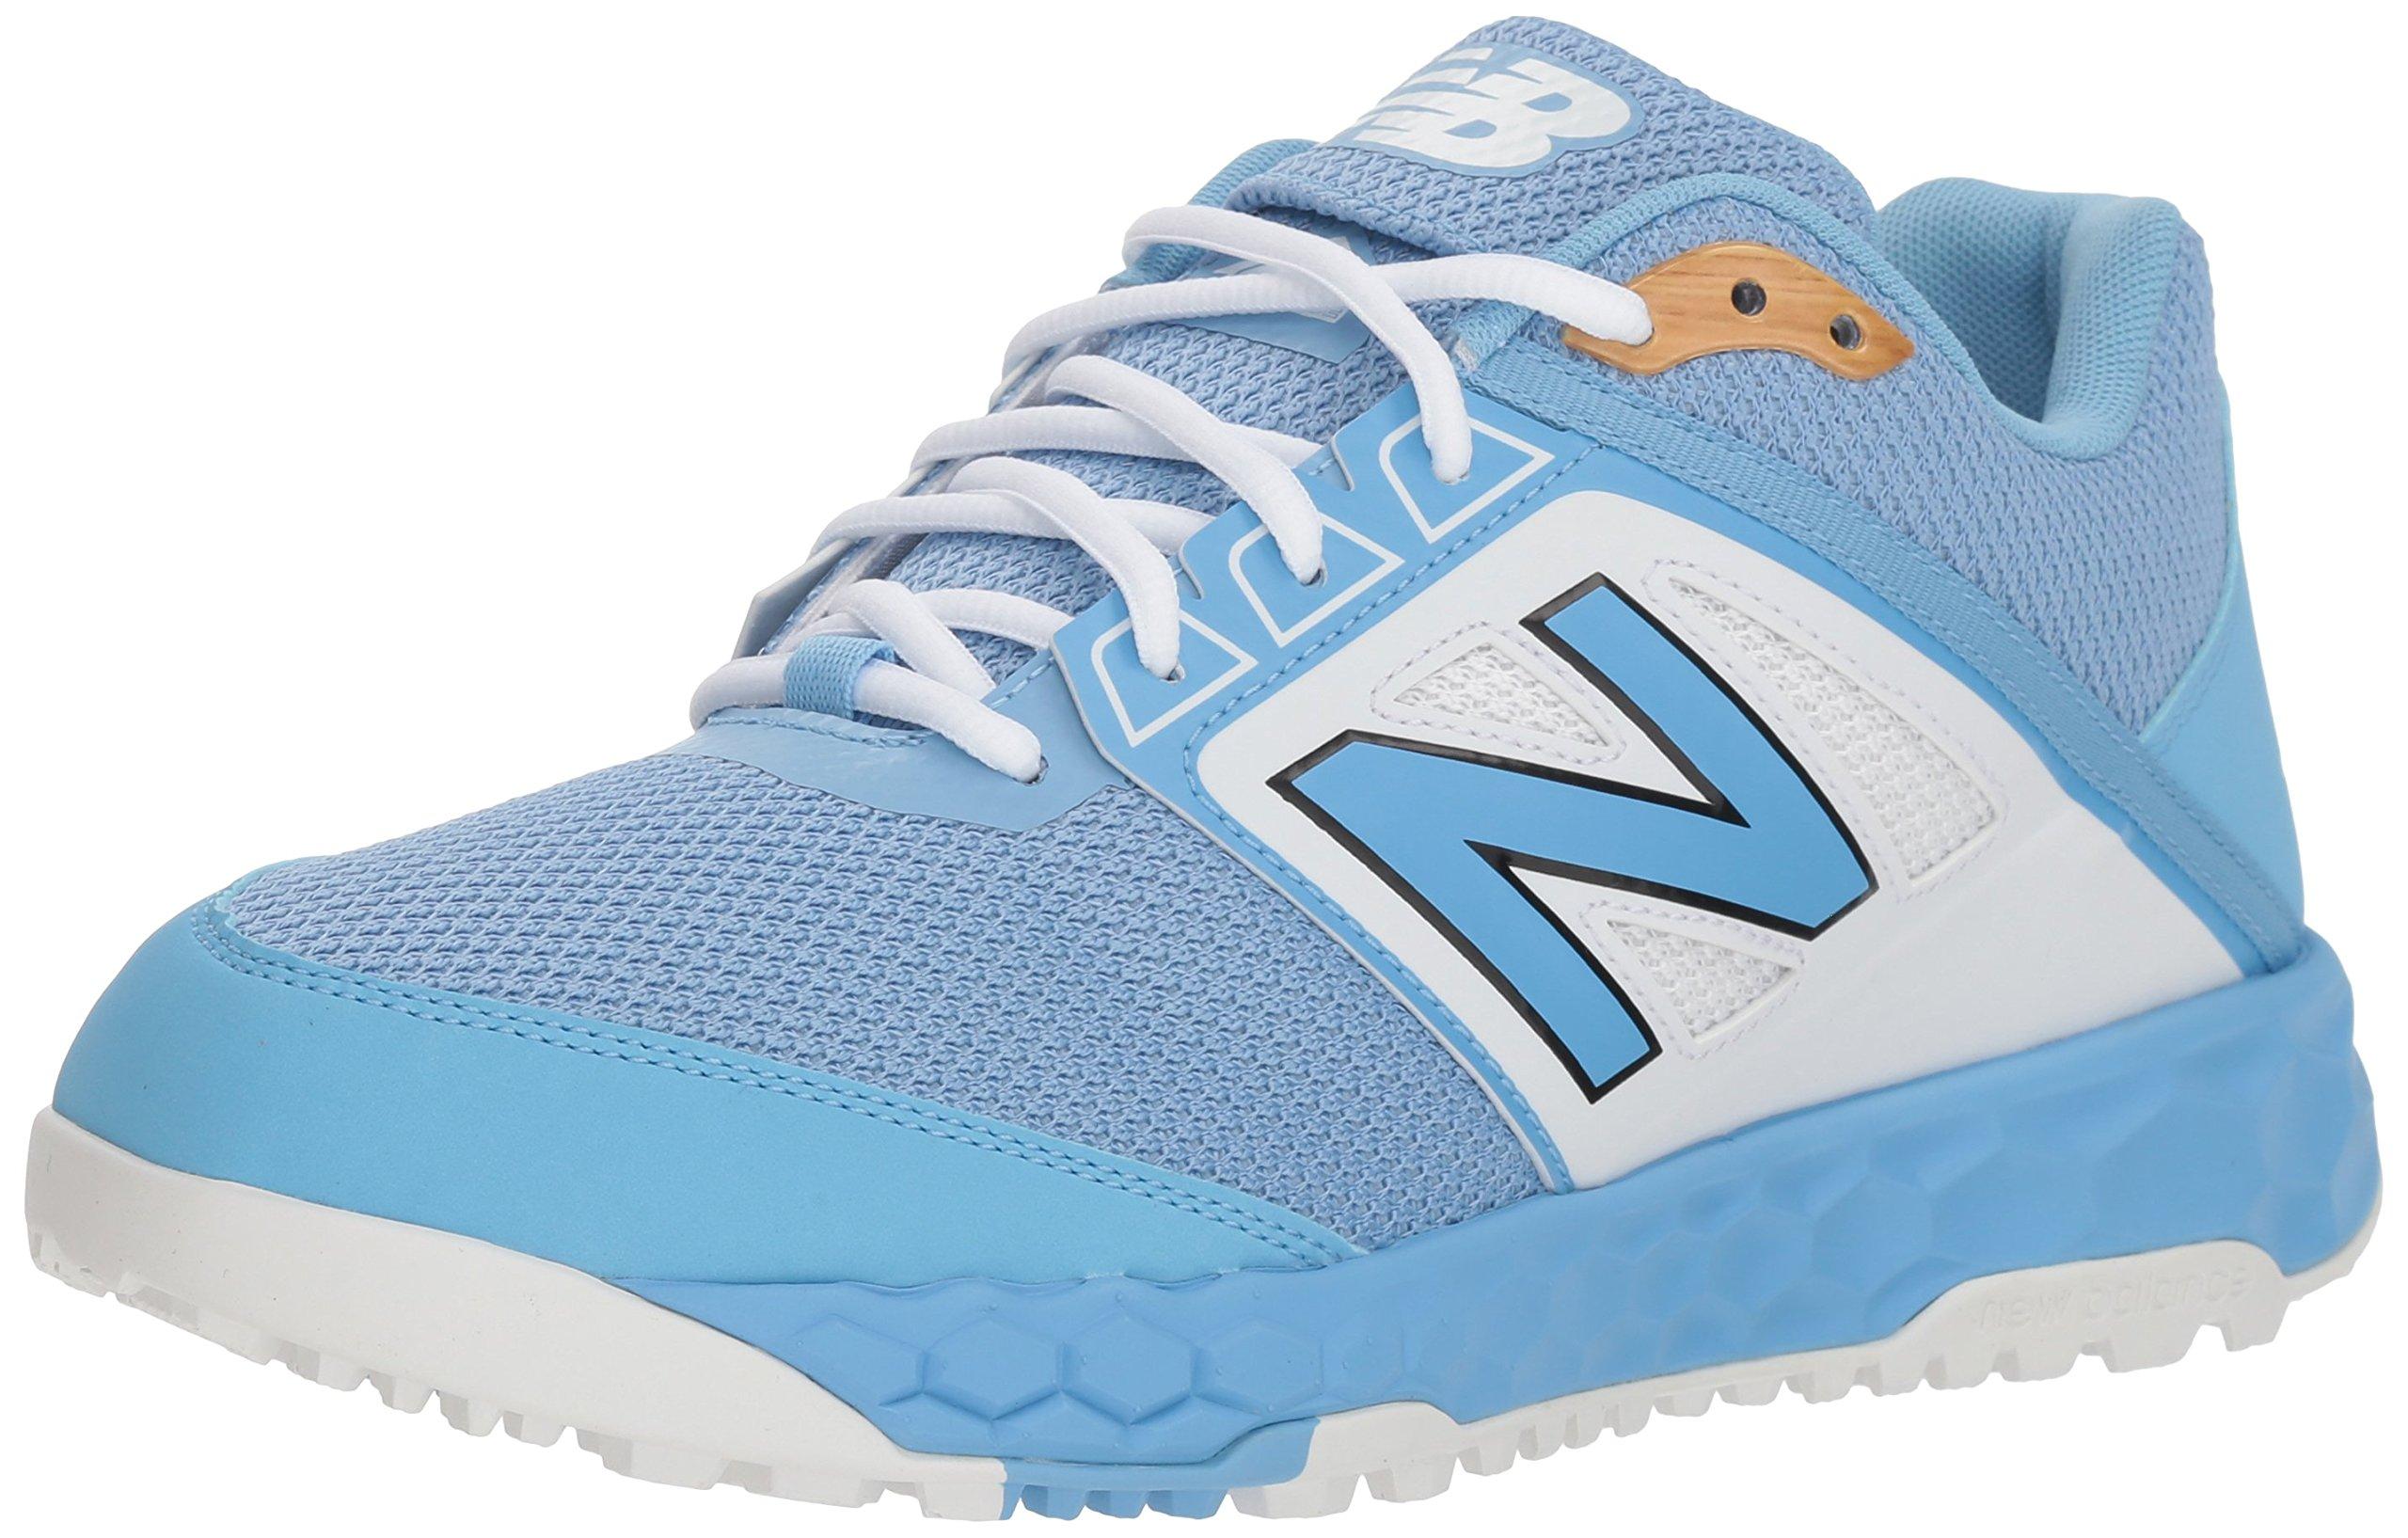 New Balance Men's 3000v4 Turf Baseball Shoe, Light Blue, 5 D US by New Balance (Image #1)